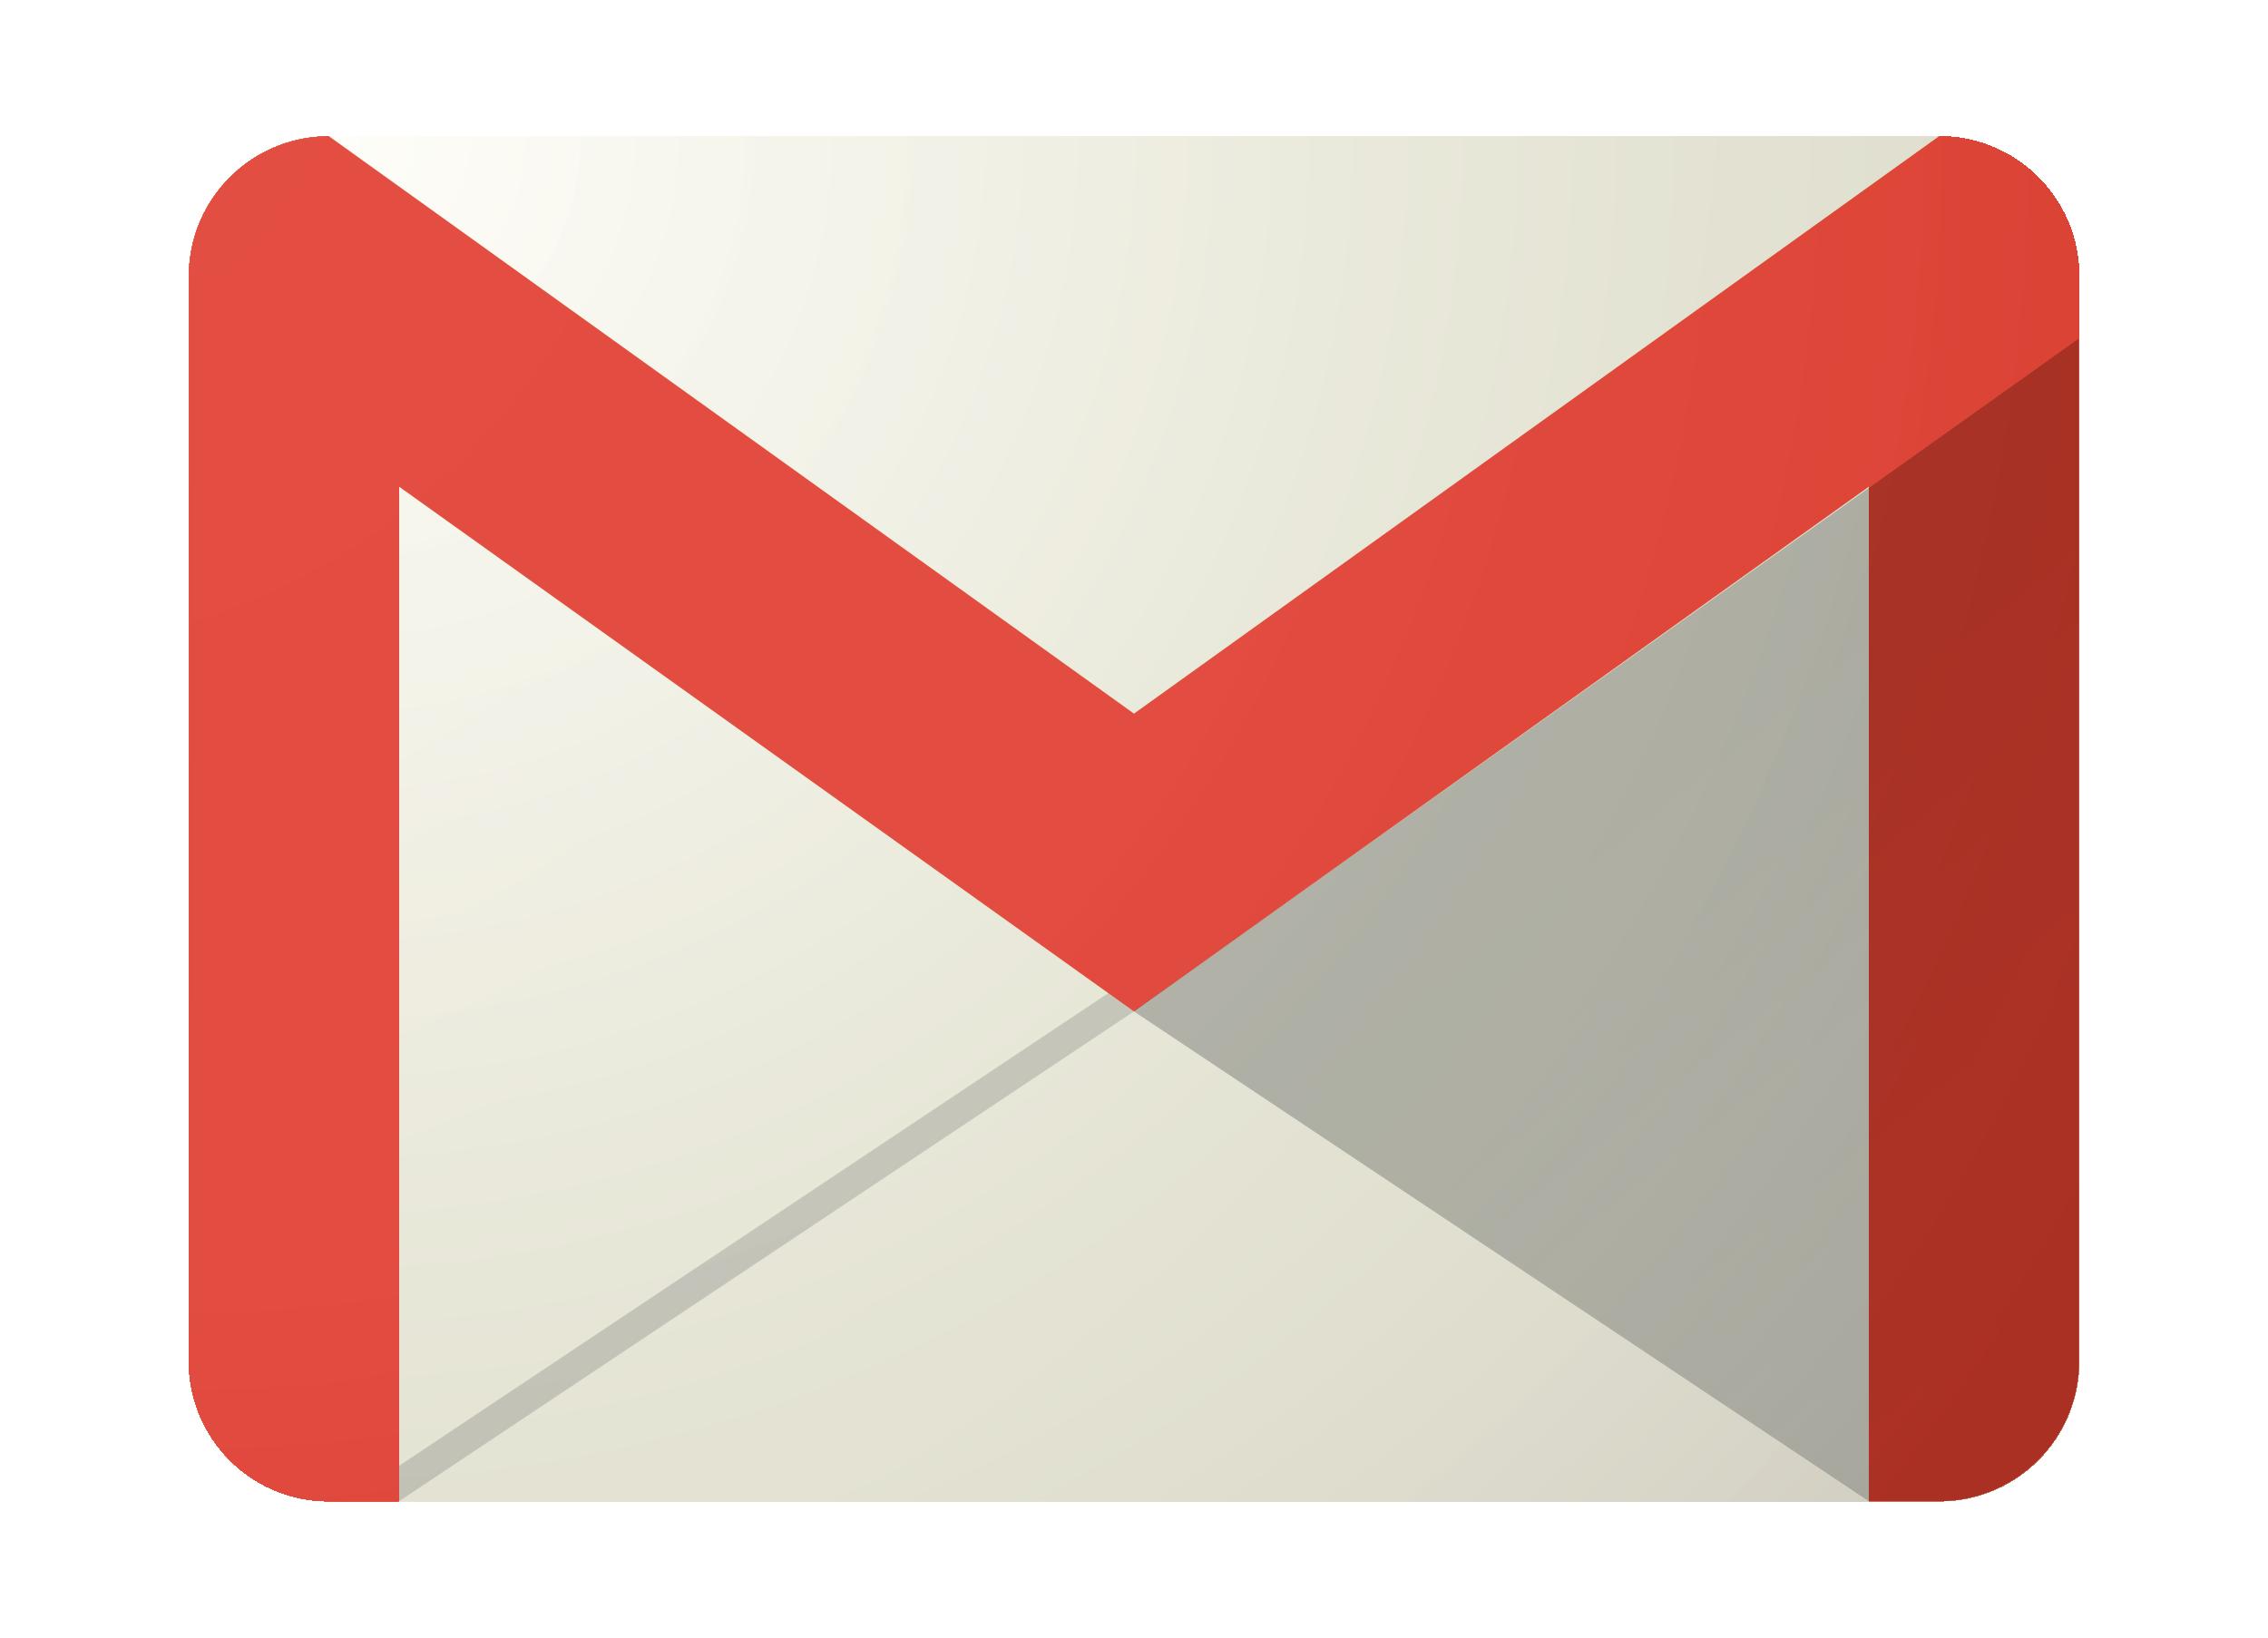 Gmail pop3 langsom problem